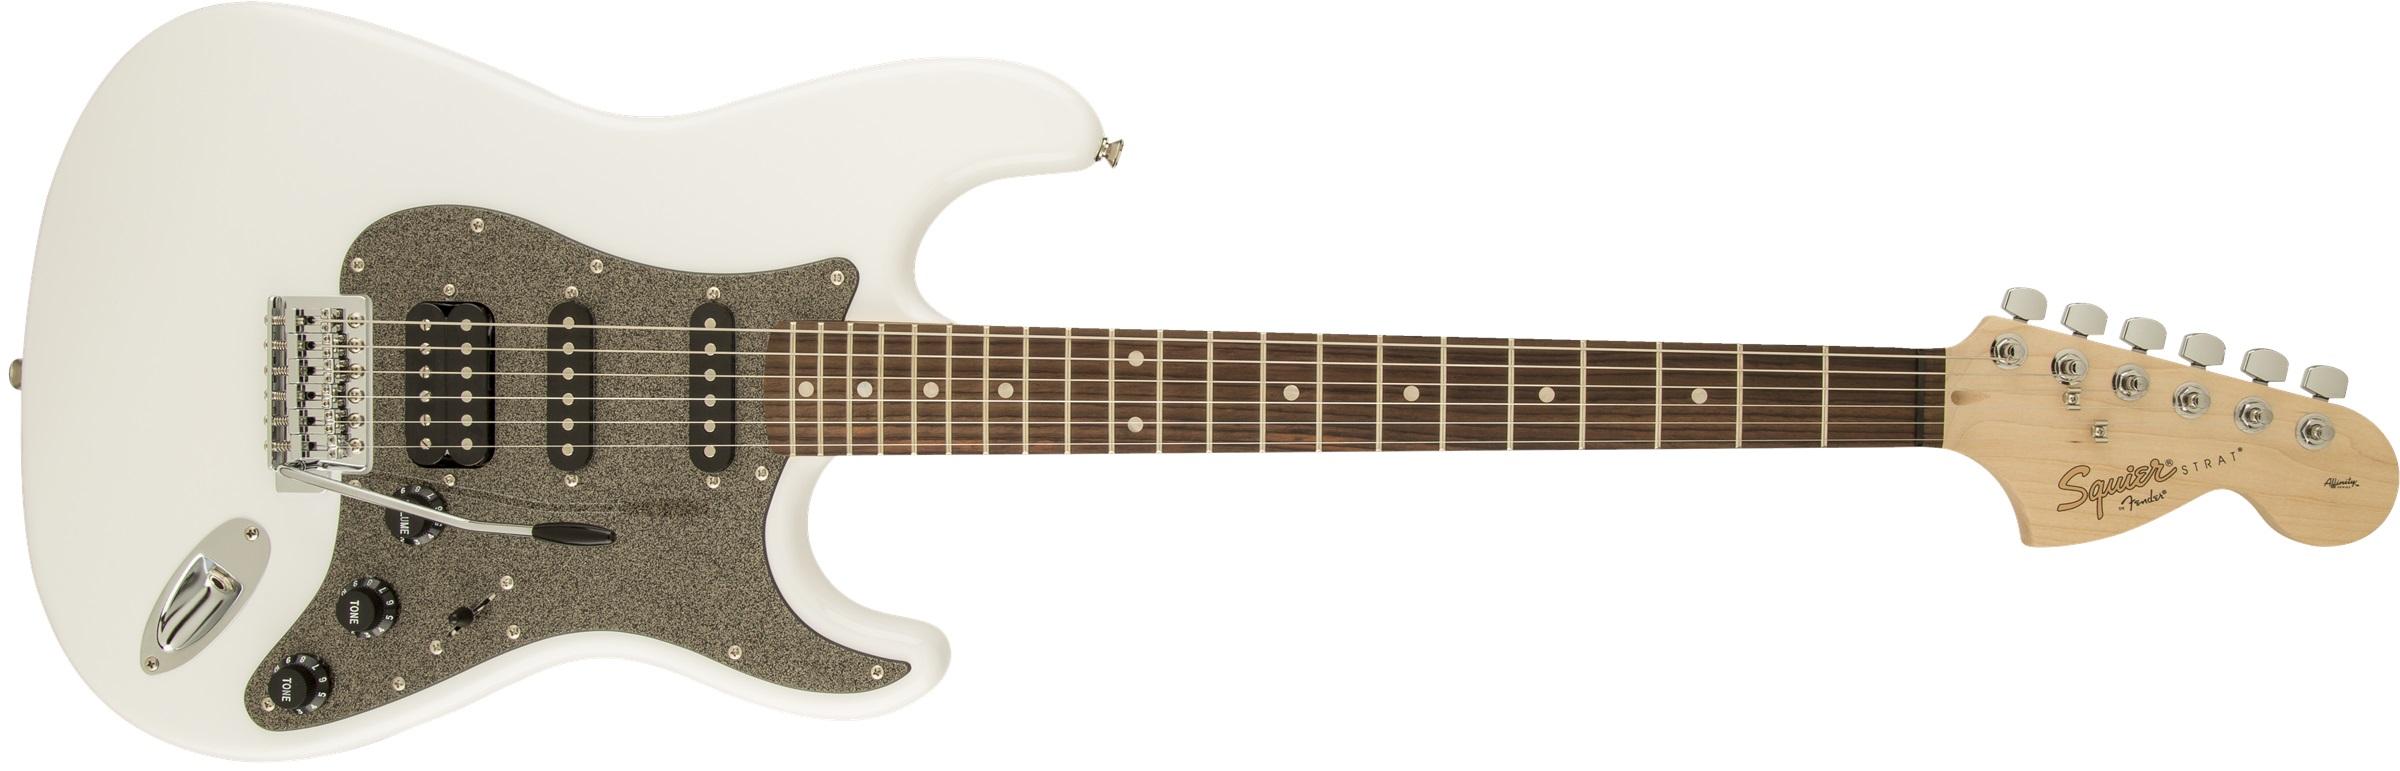 Fender Squier Affinity Stratocaster HSS LRL OW